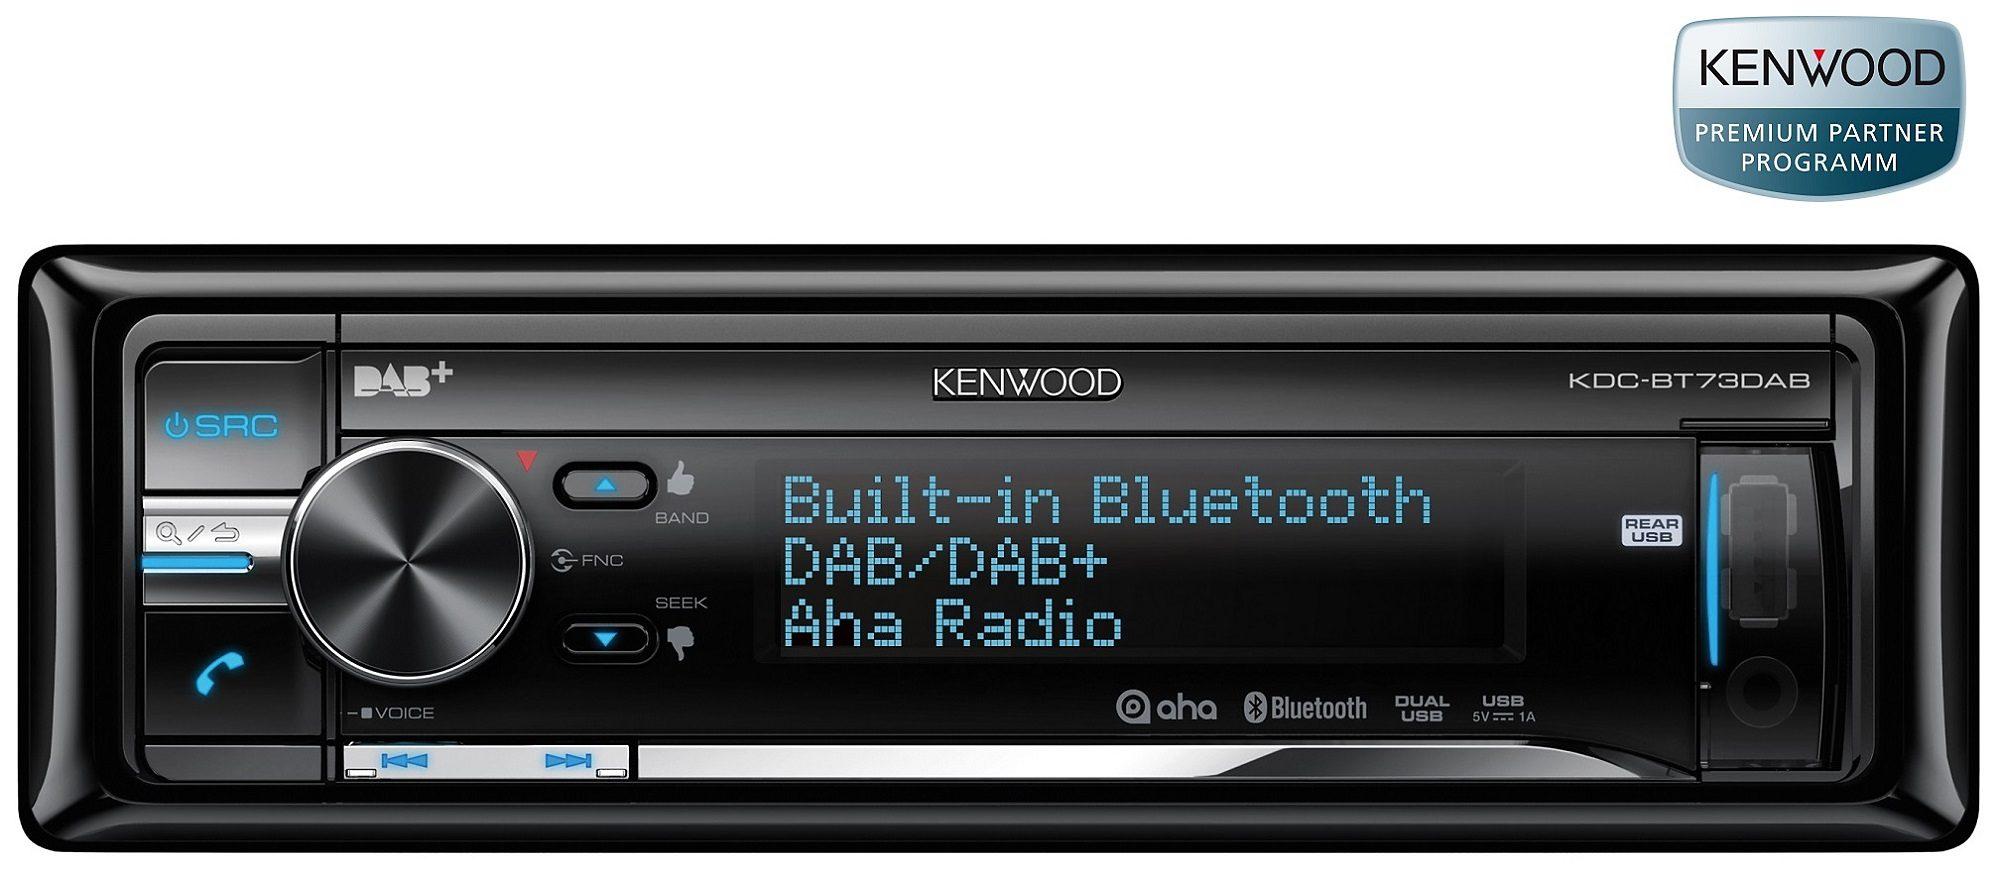 Kenwood 1-DIN Digital-Autoradio »KDC-BT73DAB«